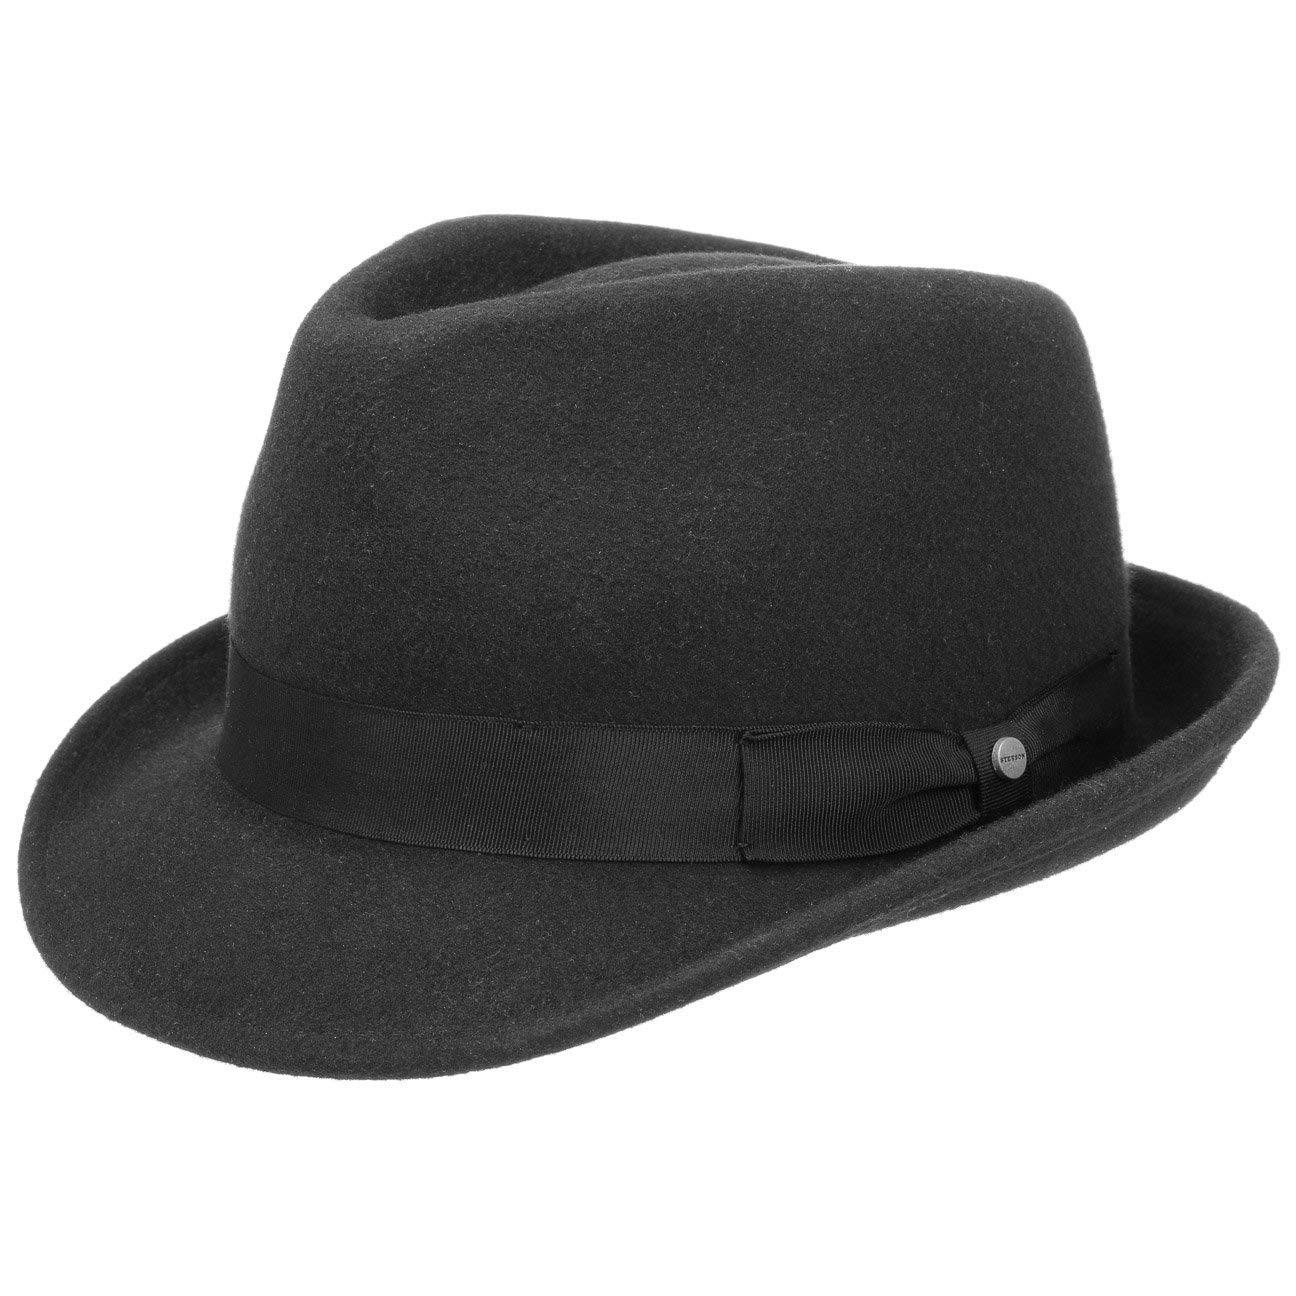 7899e0cee0651 Stetson Elkader Trilby Felt Hat Women Men